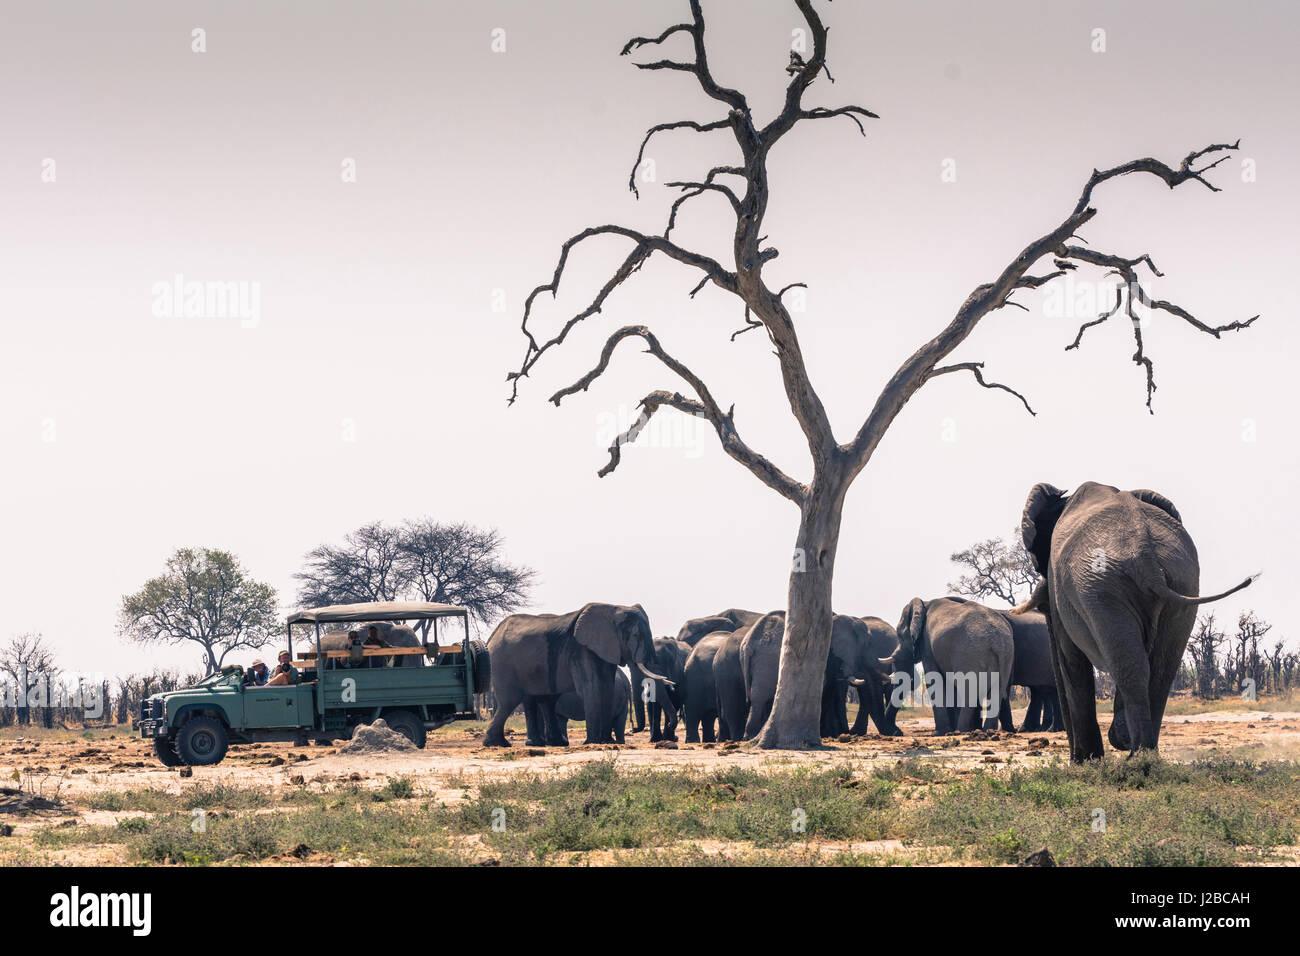 Botswana. Chobe National Park. Savuti. Safari vehicle and a herd of elephants. - Stock Image